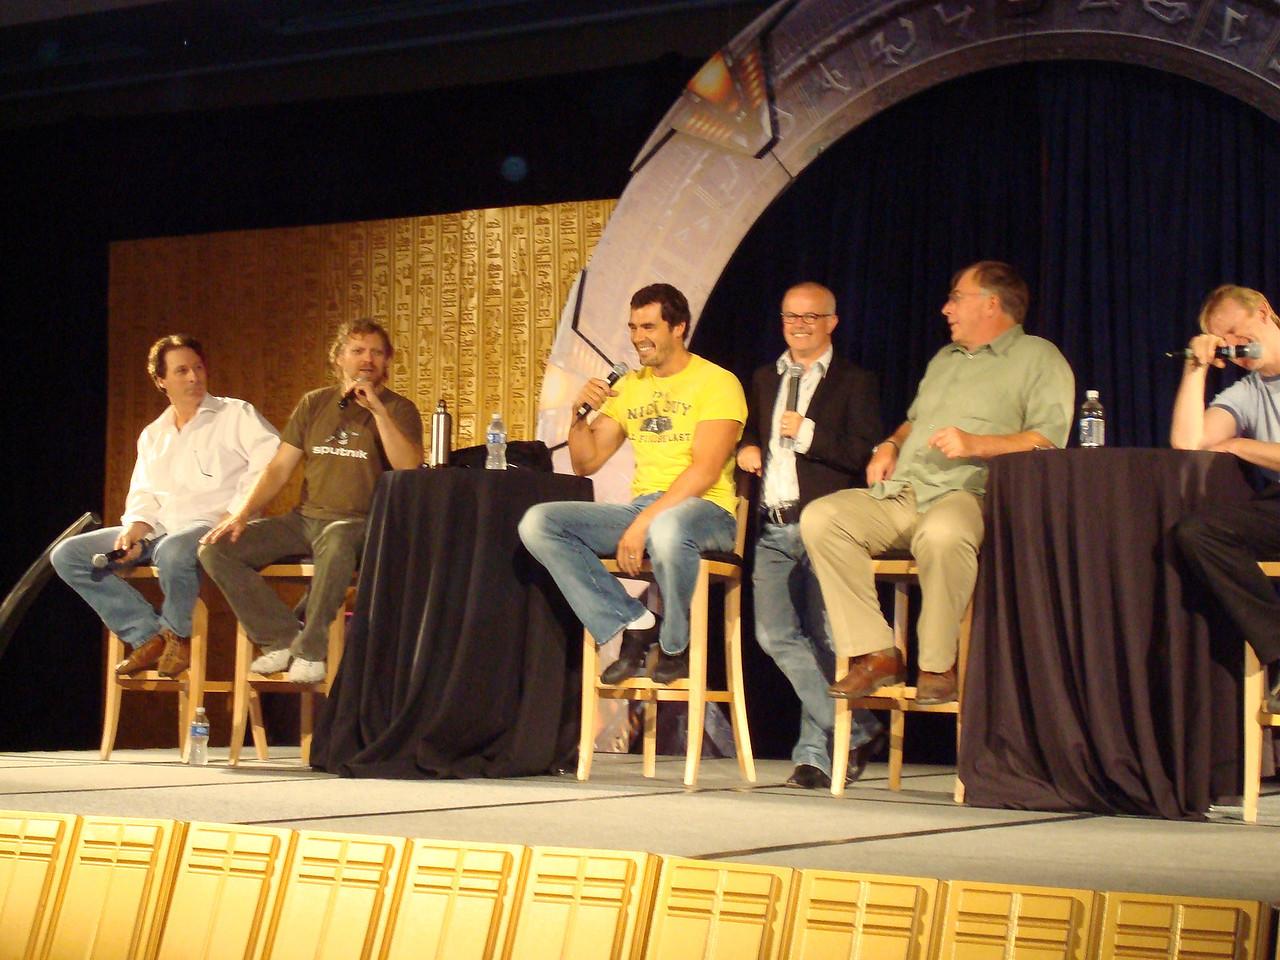 Garwin Sanford (Narim, Simon Wallis), Alex Zahara (a bunch of different Stargate characters), Dan Payne (Super Soldier, Wraith Warrior), Gary Jones (Sgt. Walter Davis/Harriman), Gary Chalk (Colonel Chekhov), Dean Haglund (one of the Lone Gunmen from X-Files)